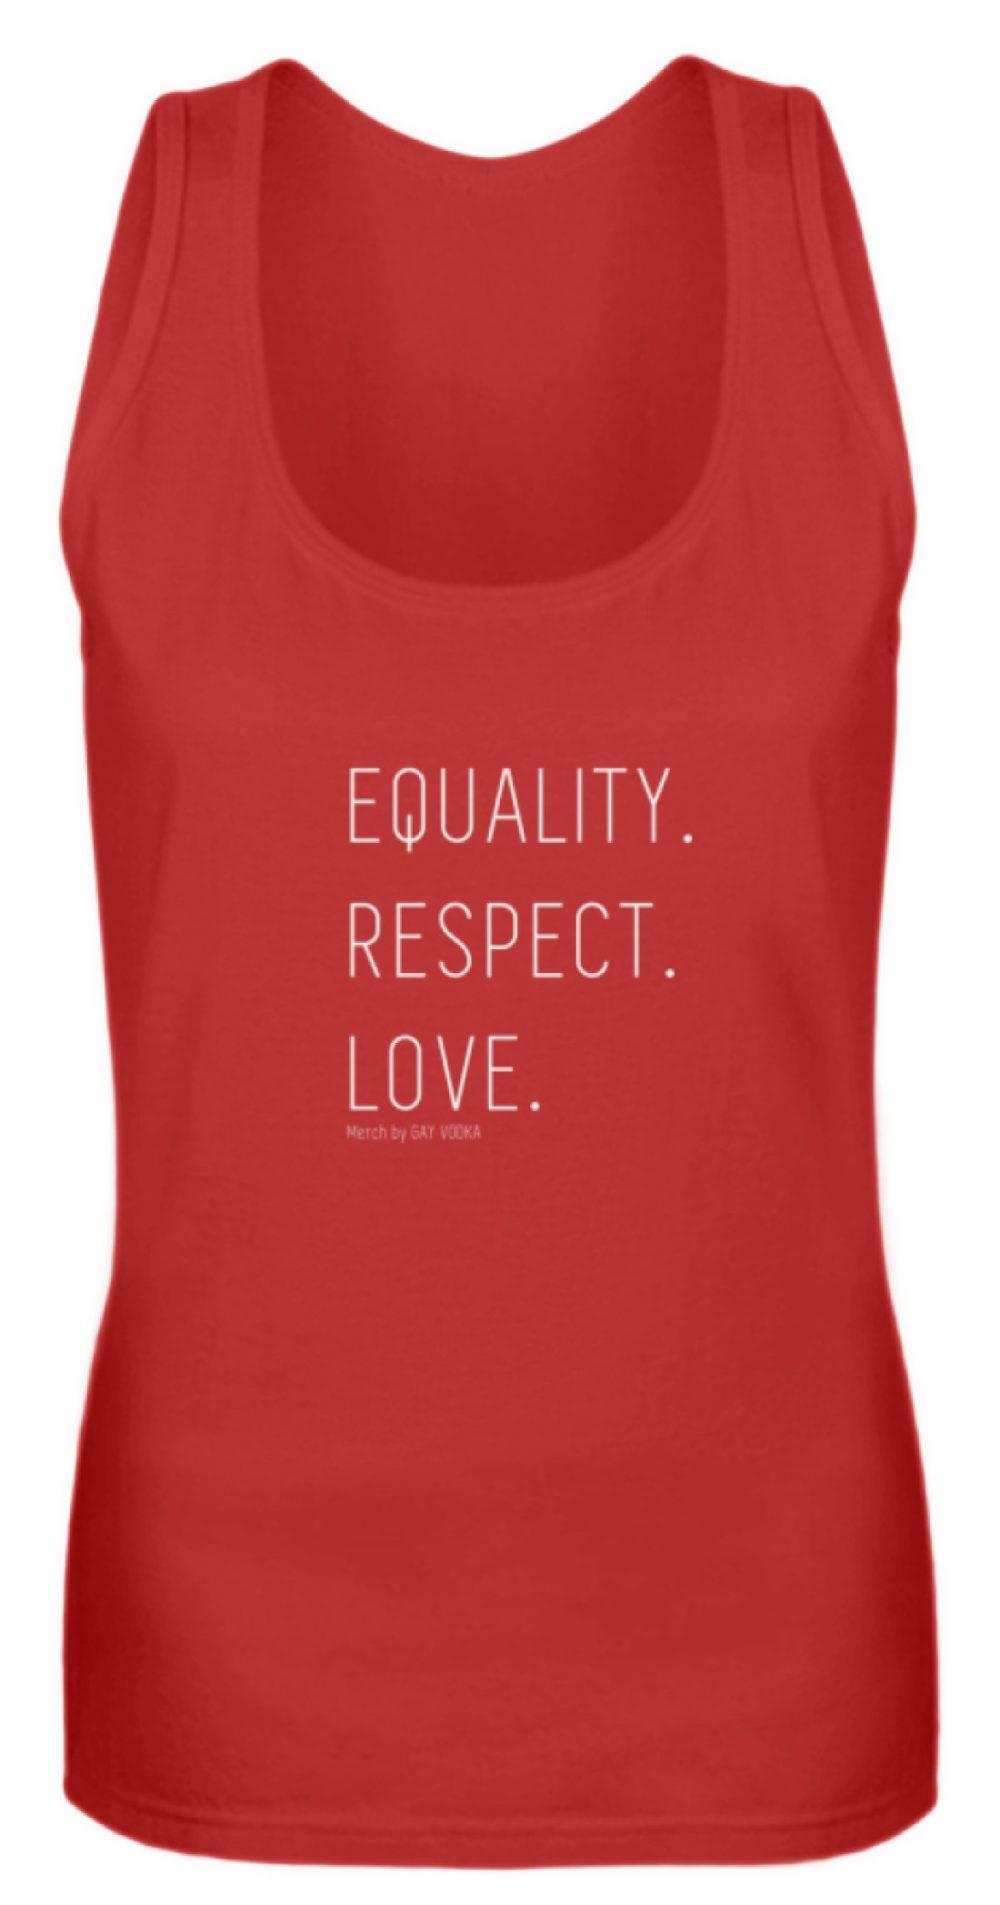 EQUALITY. RESPECT. LOVE. - Frauen Tanktop-4